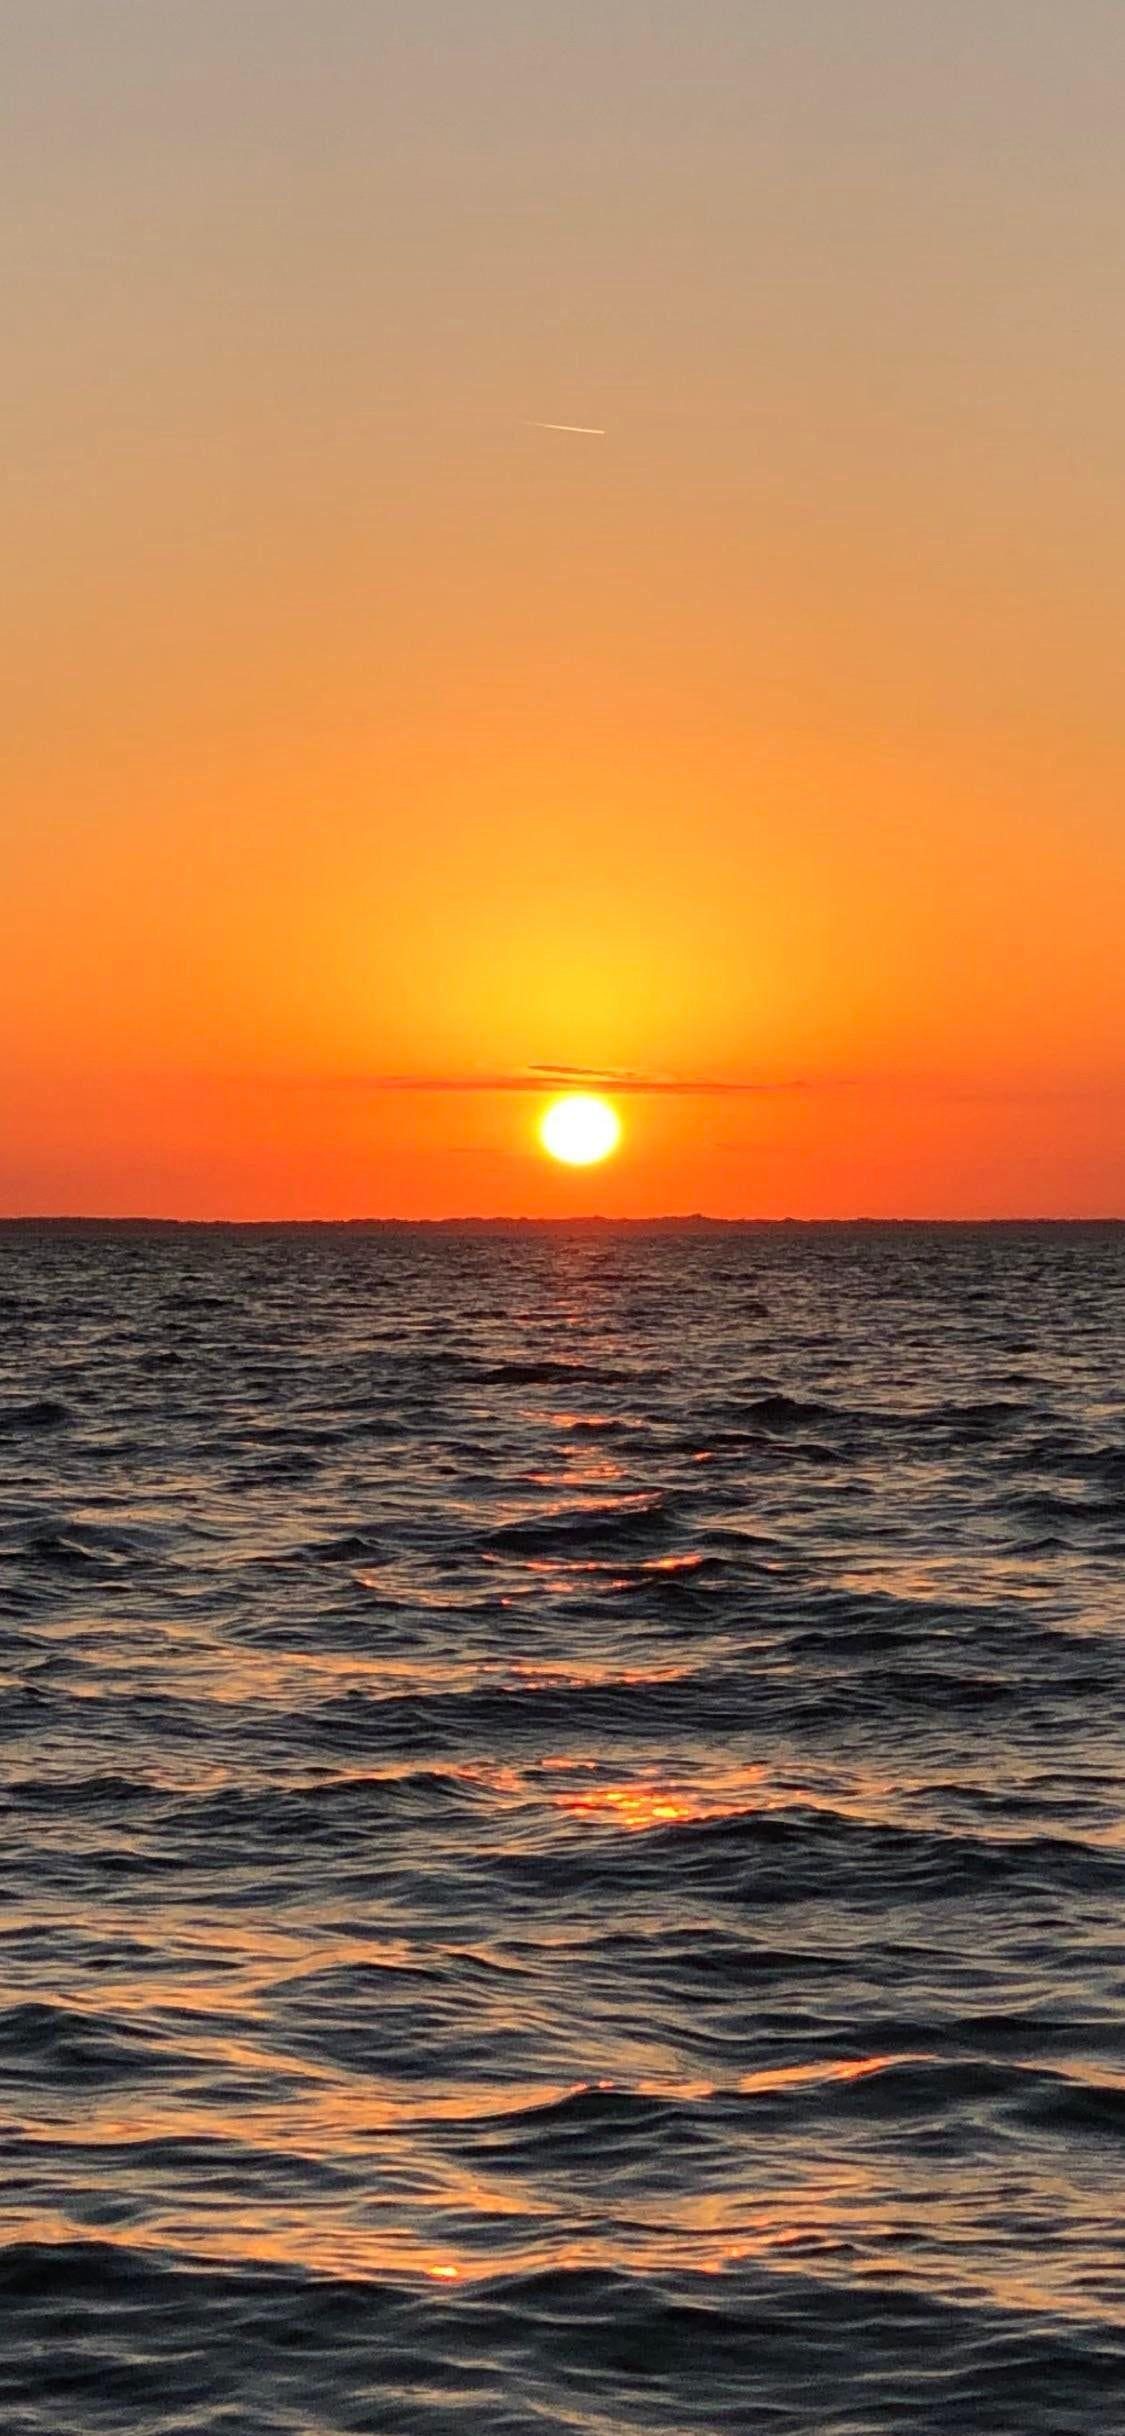 Florida Sunset Iphone Wallpapers Top Free Florida Sunset Iphone Backgrounds Wallpaperaccess